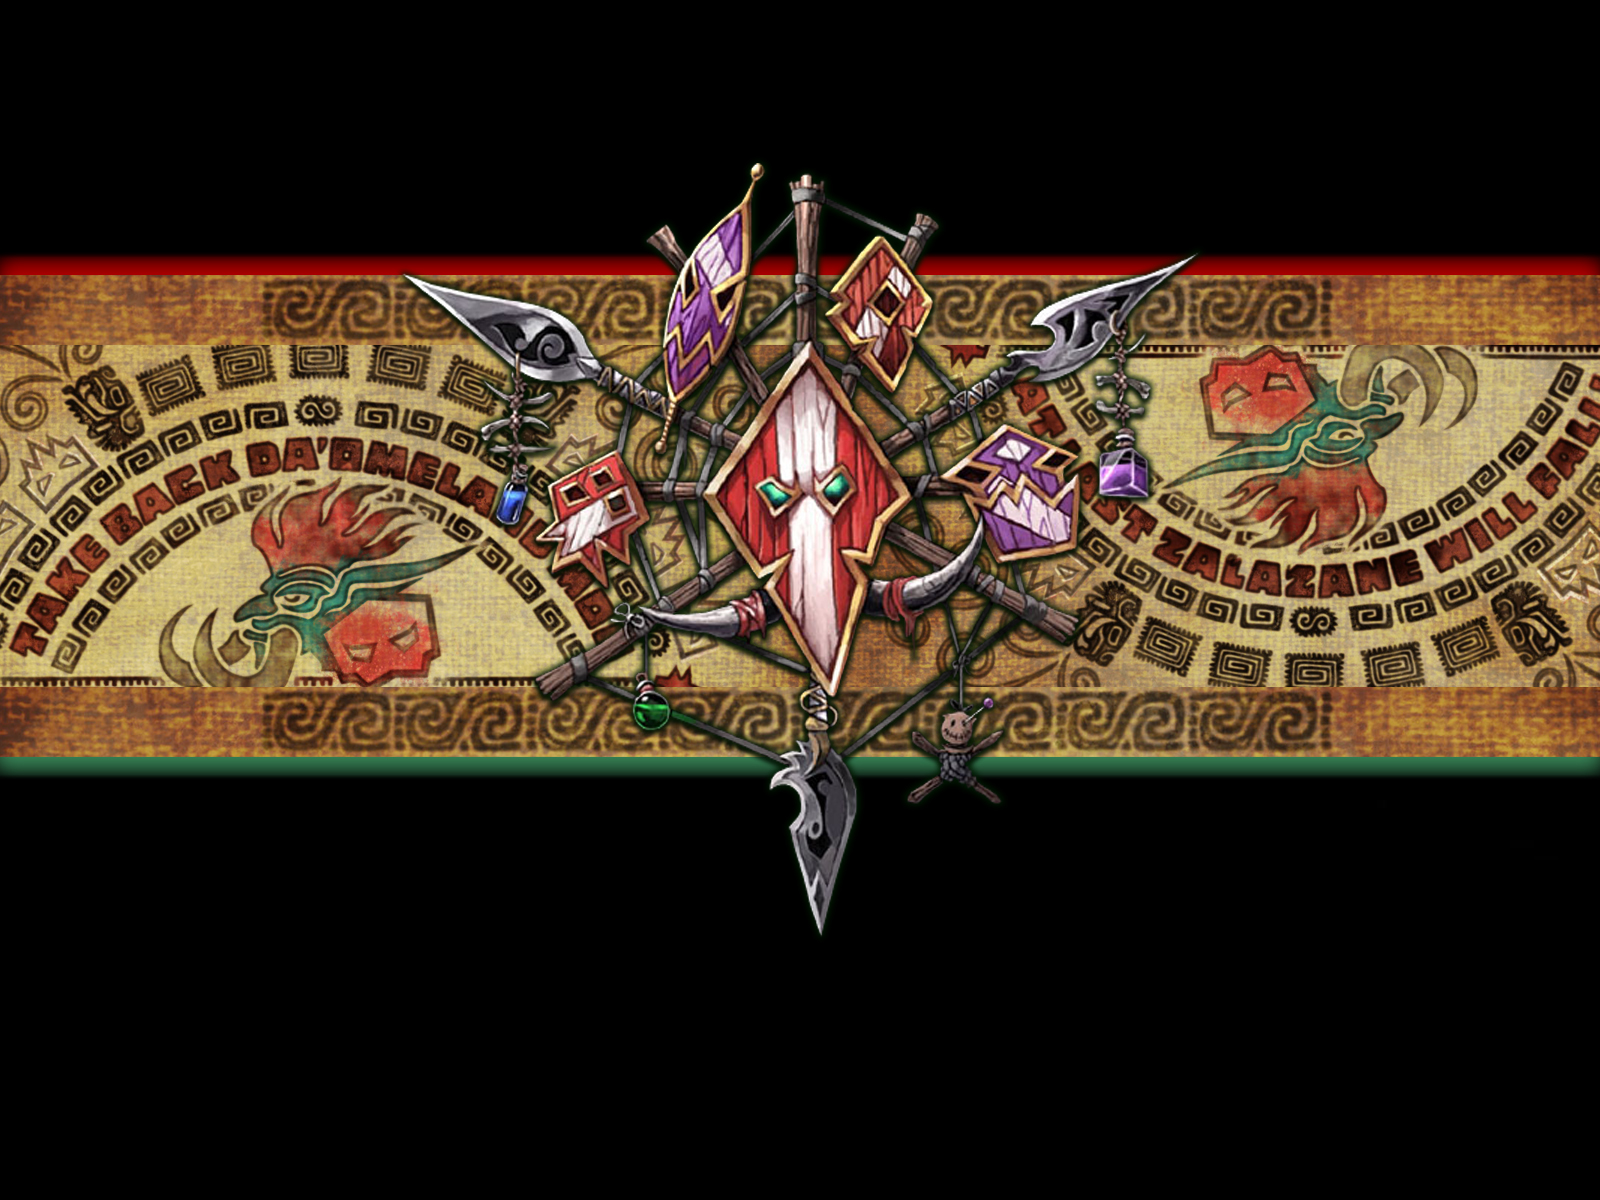 troll crest wallpaper by alakazum on deviantart